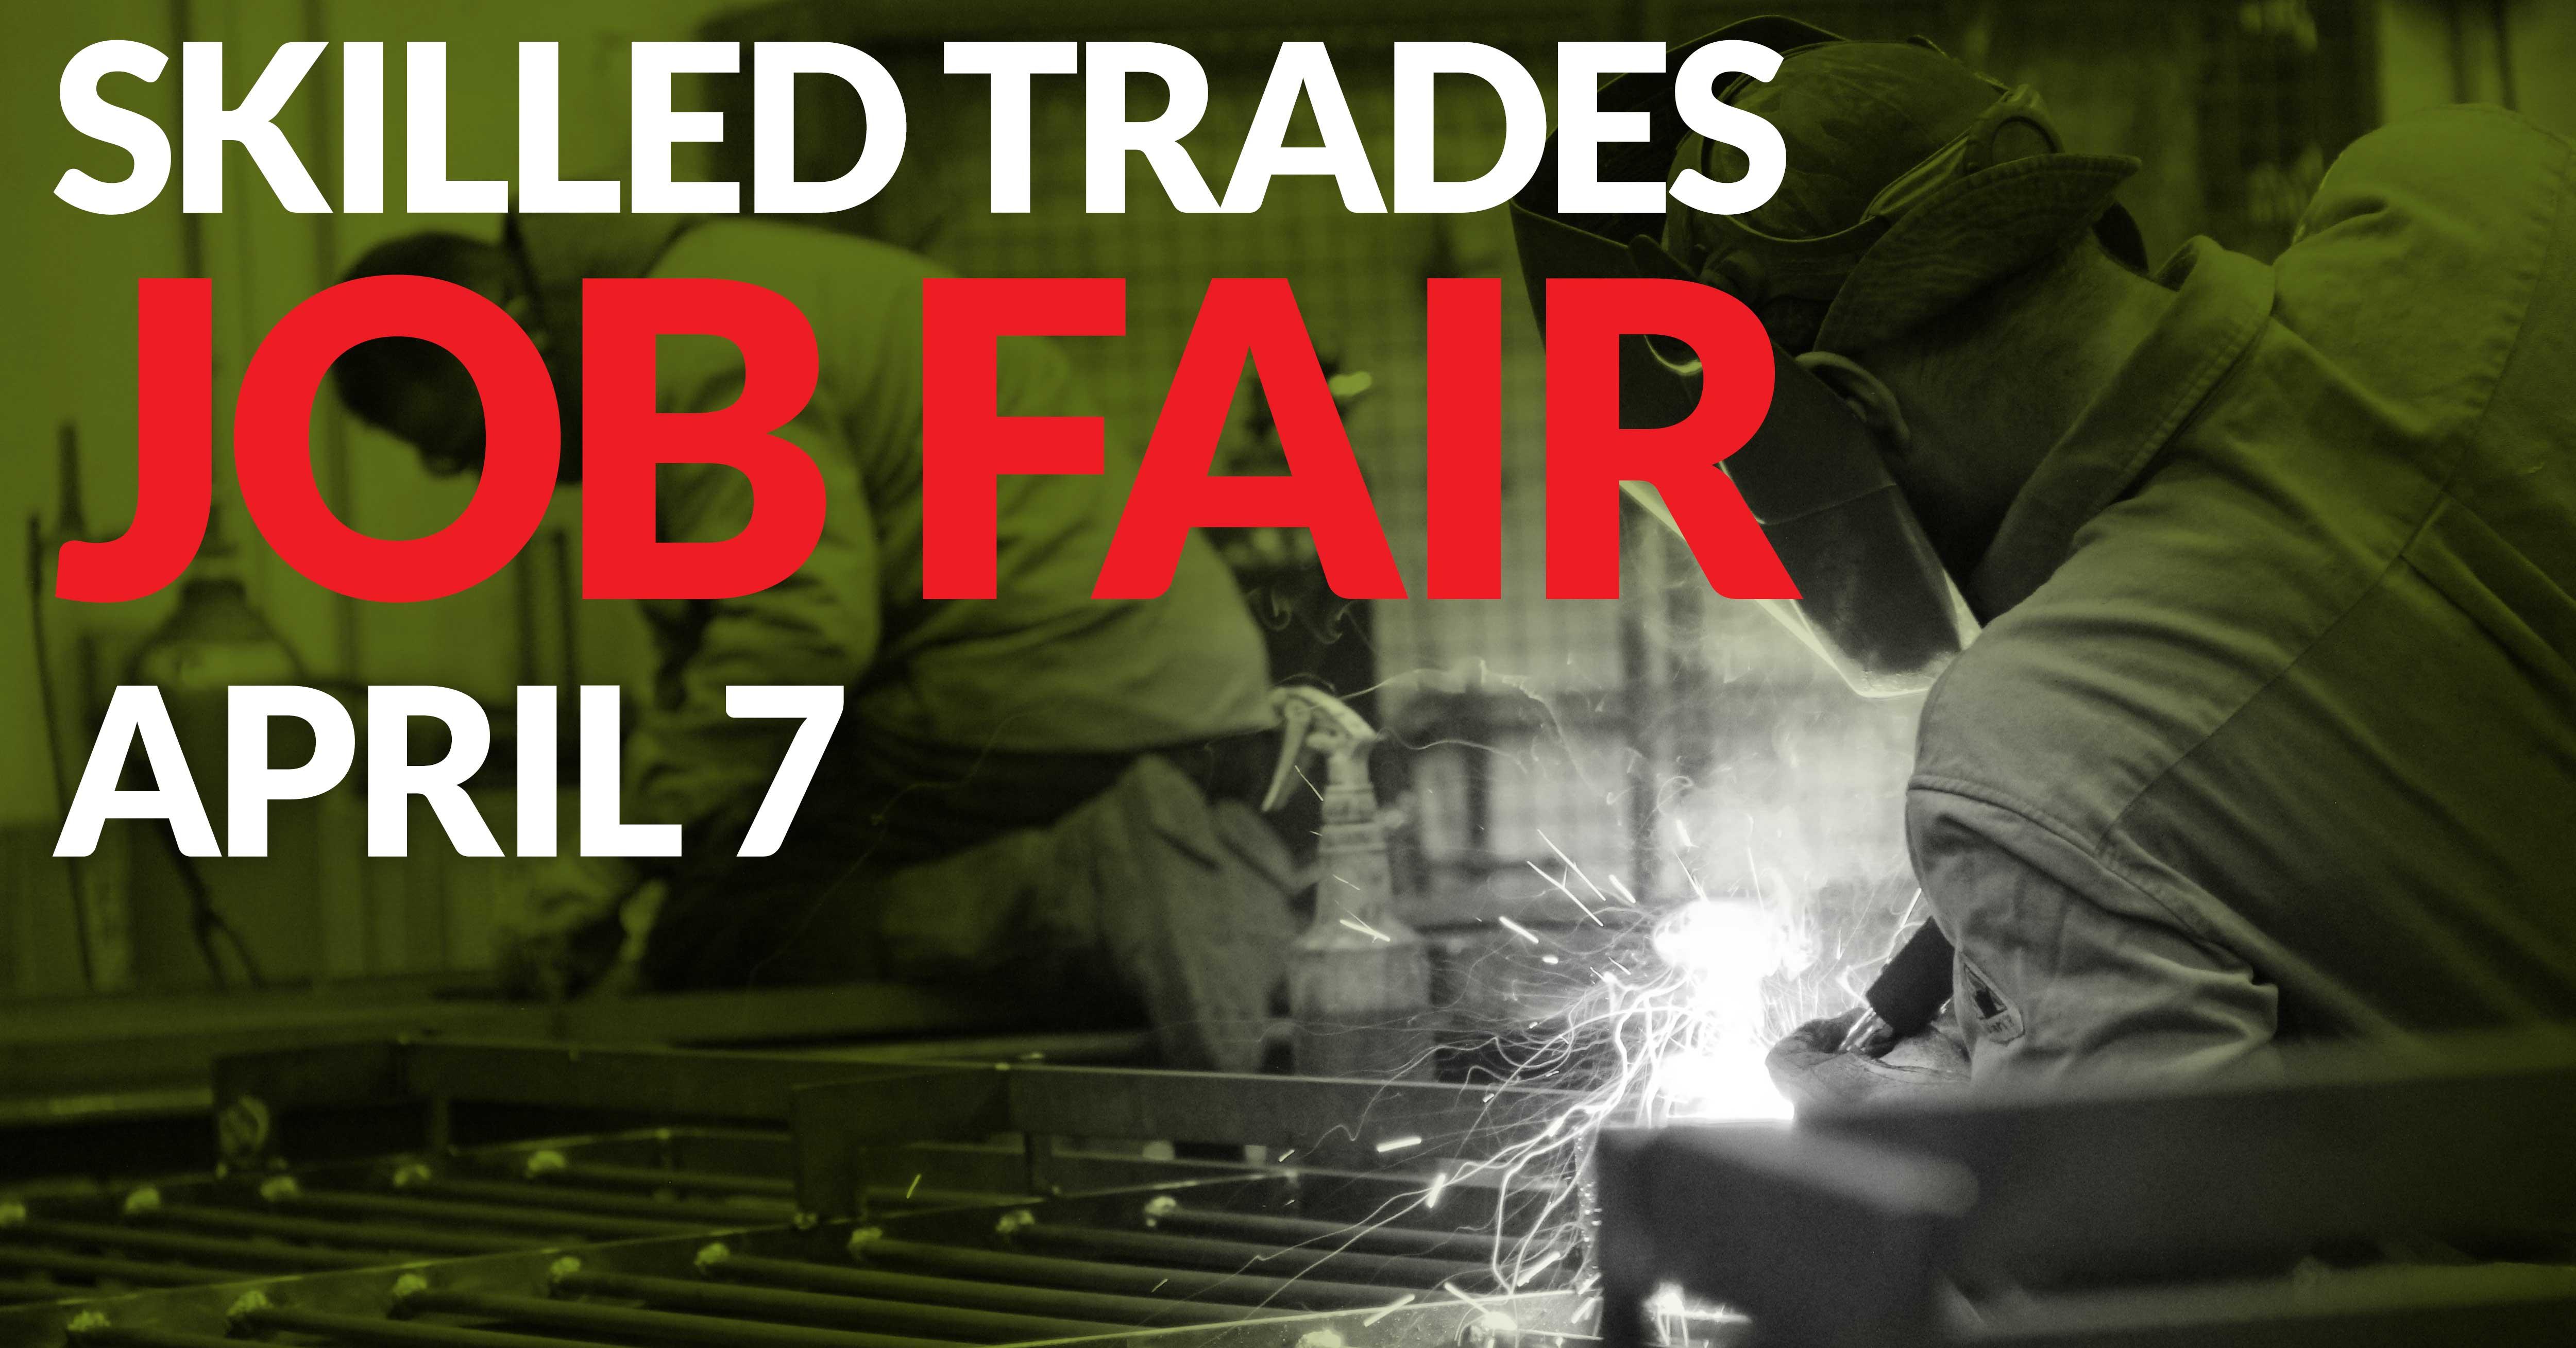 Facebook-Skilled-Trades-Job-Fair-Ad-2018